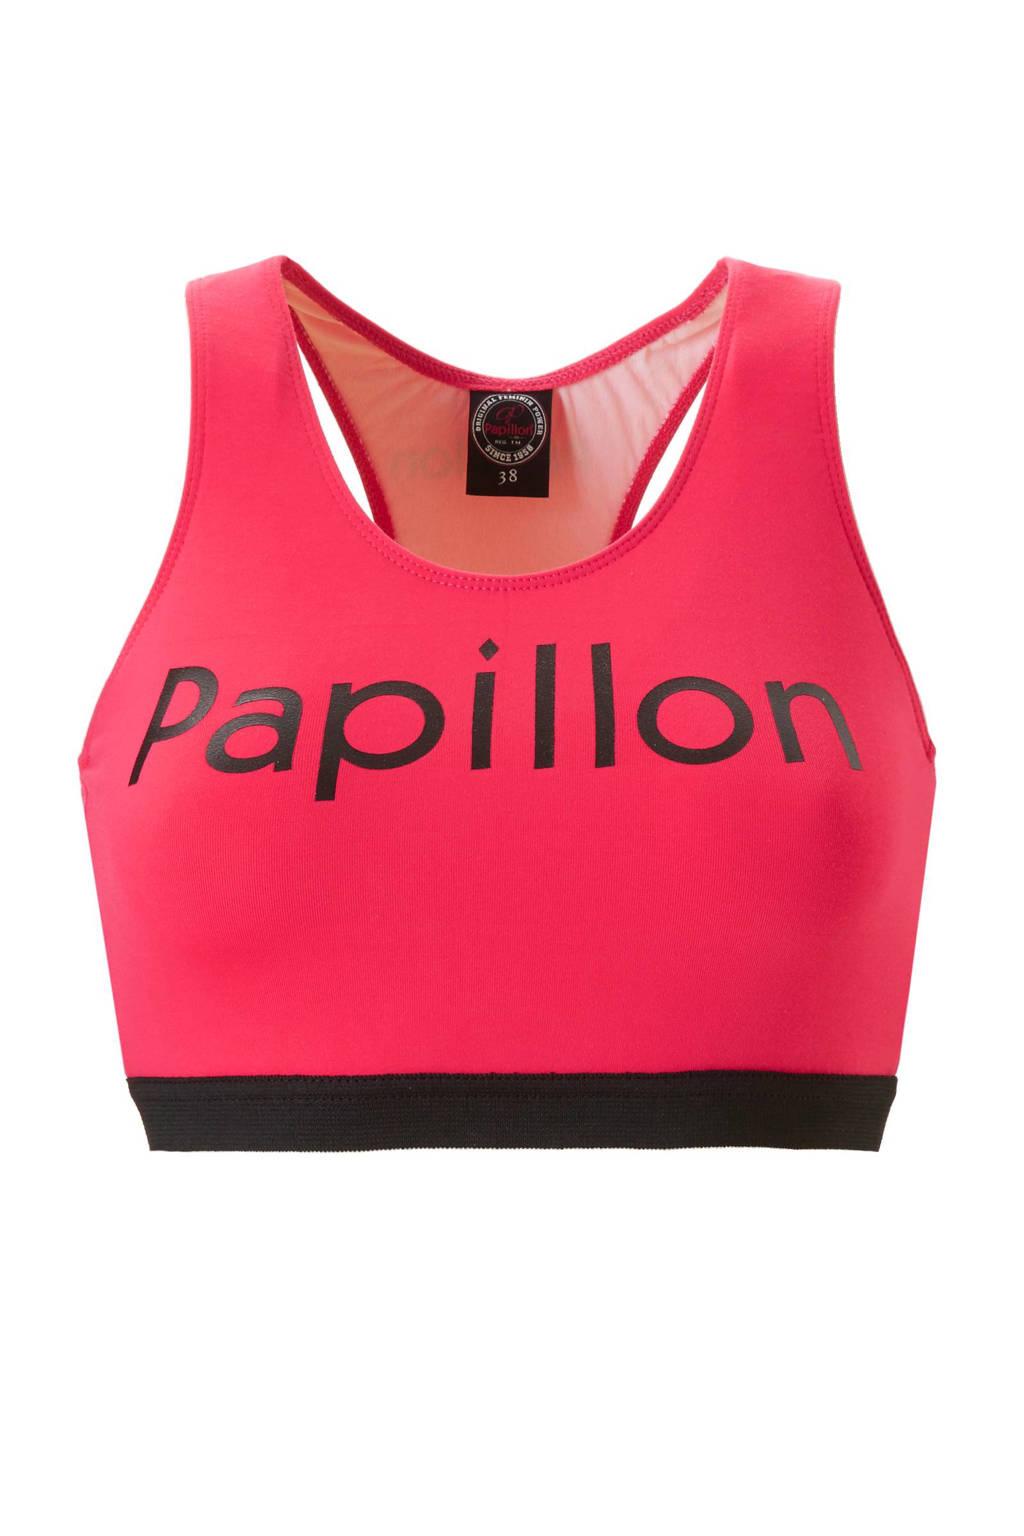 Papillon Level 1 sportbh donkerroze, Donkerroze/zwart